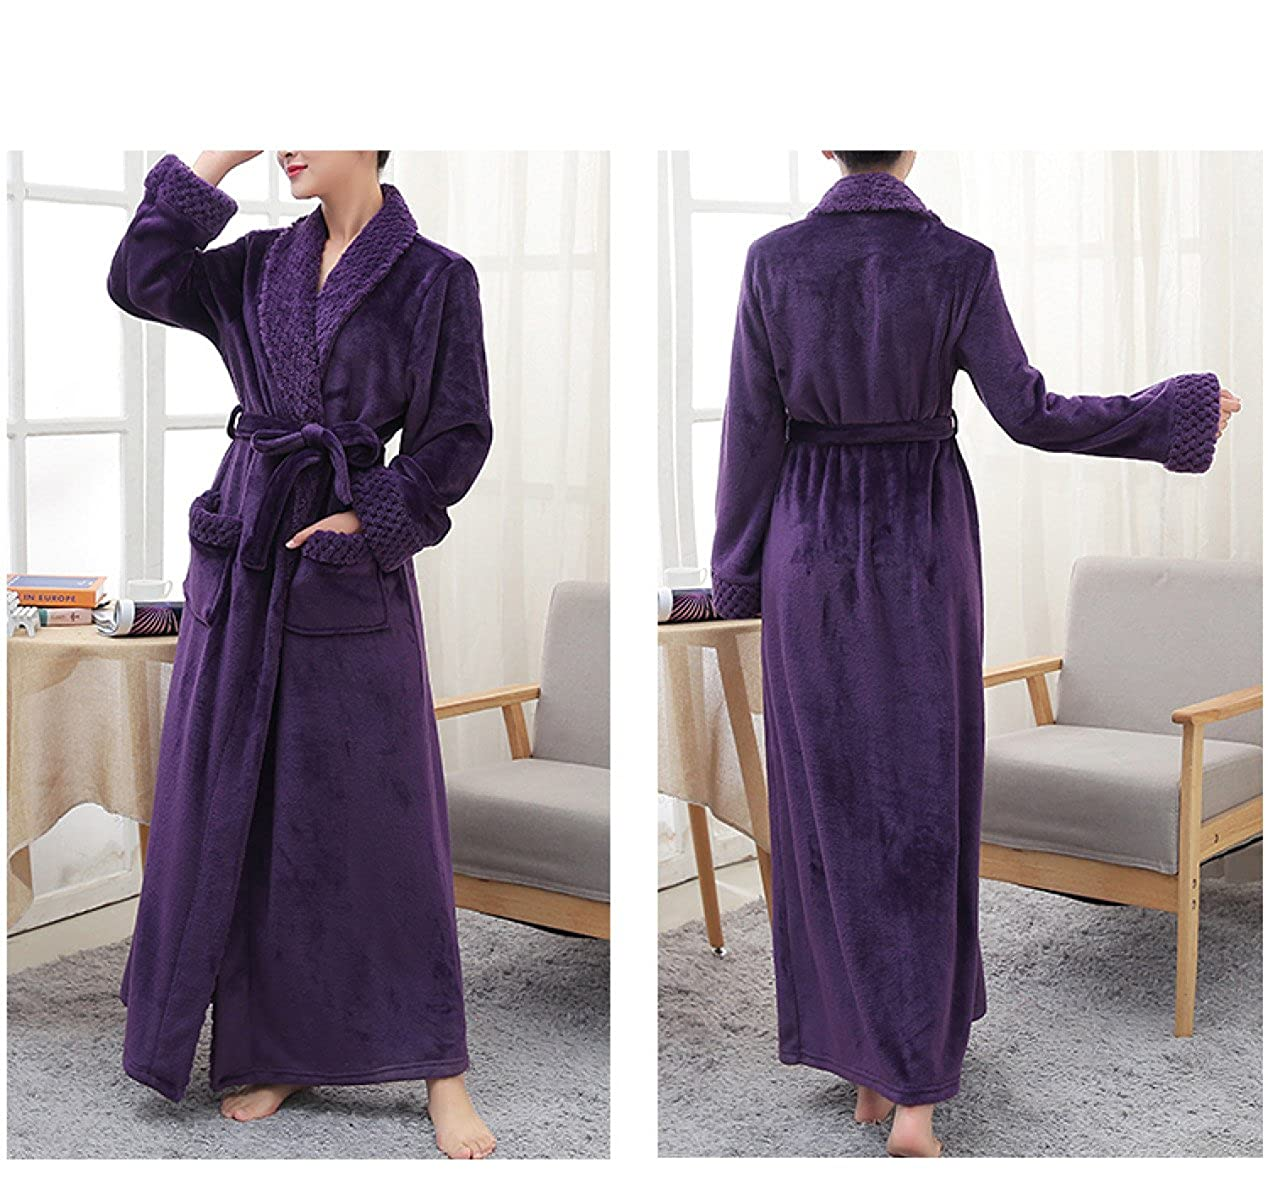 Women s Men s Unisex Fall Winter Flannel Cozy Home Bathrobe Bathrobe  Pajamas Thick Warm Long Large Size Bathrobe Thicken Long b62effe0a